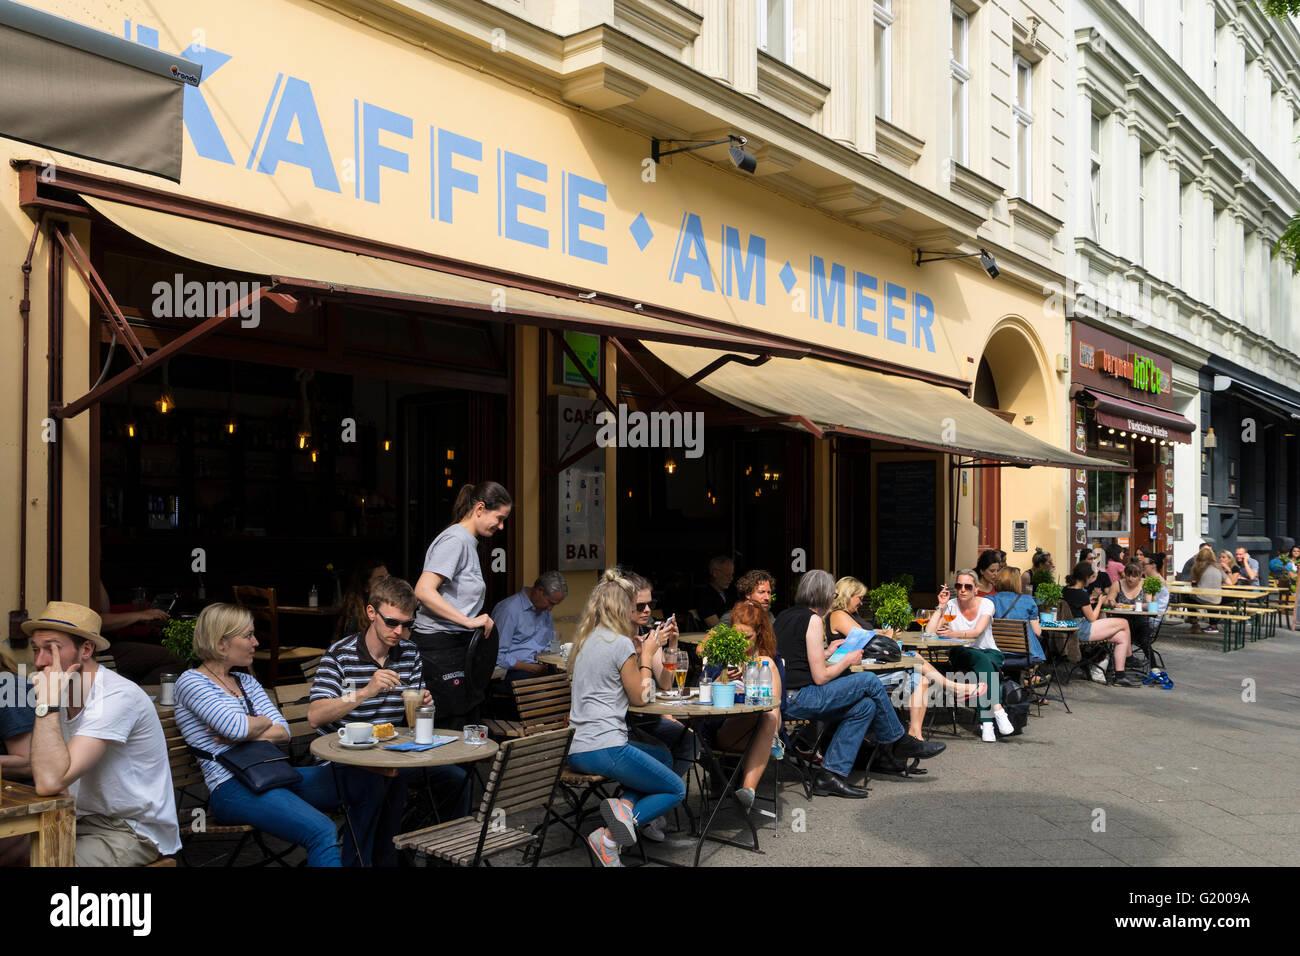 Kaffee bin Meer Café auf der Bergmannstraße in Kreuzberg Berlin Deutschland Stockbild